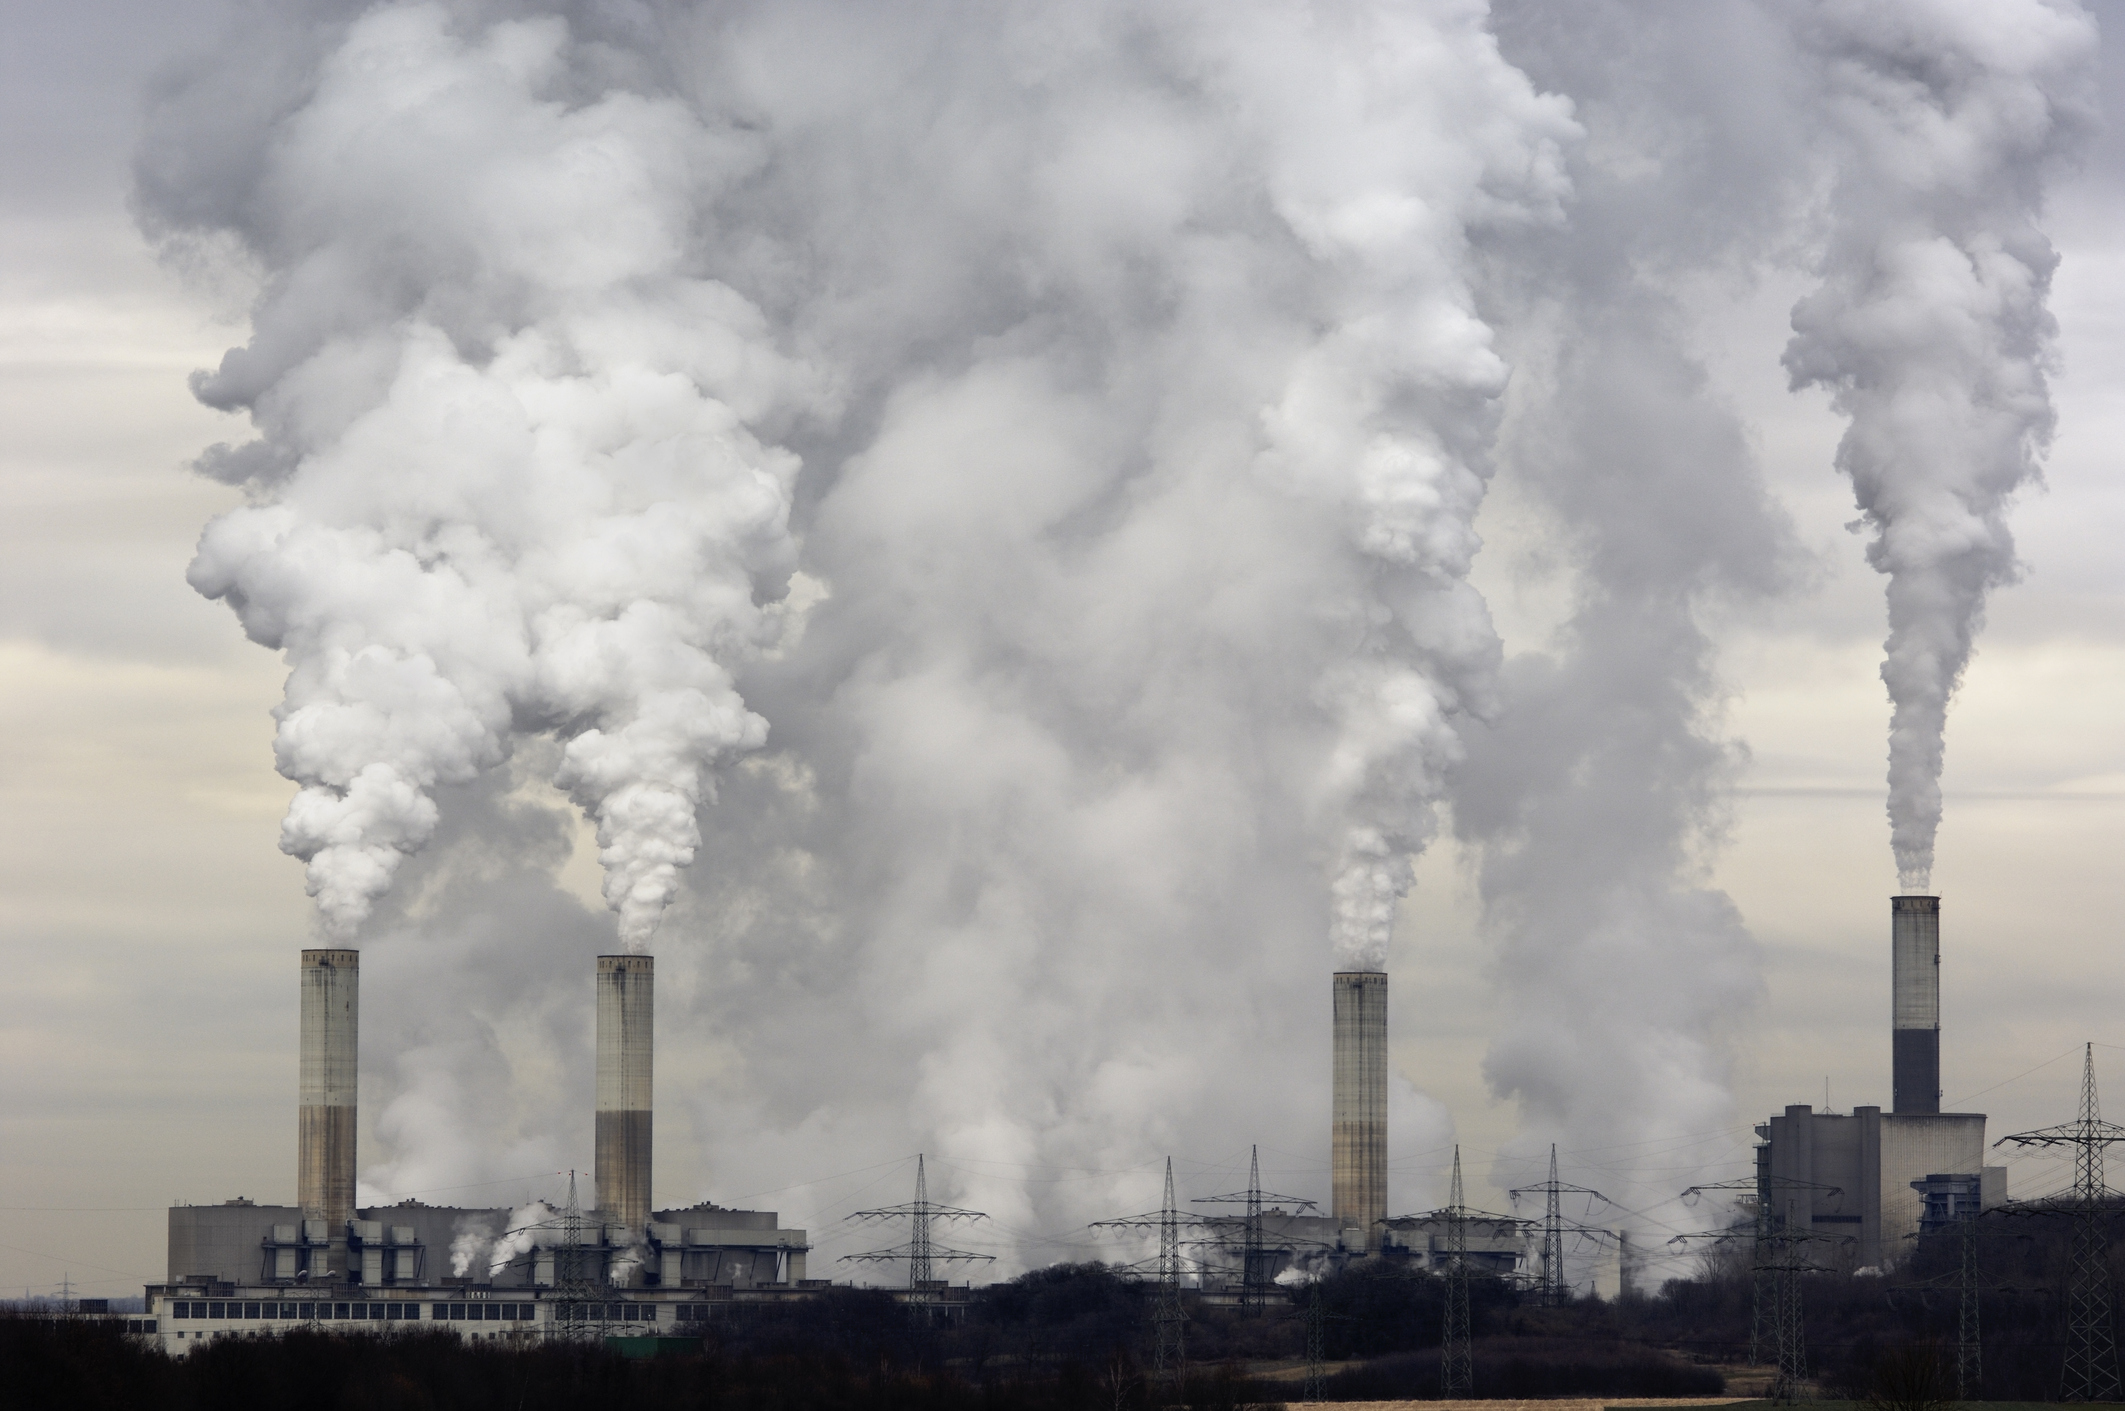 Industrial Chimneys with smoke raising